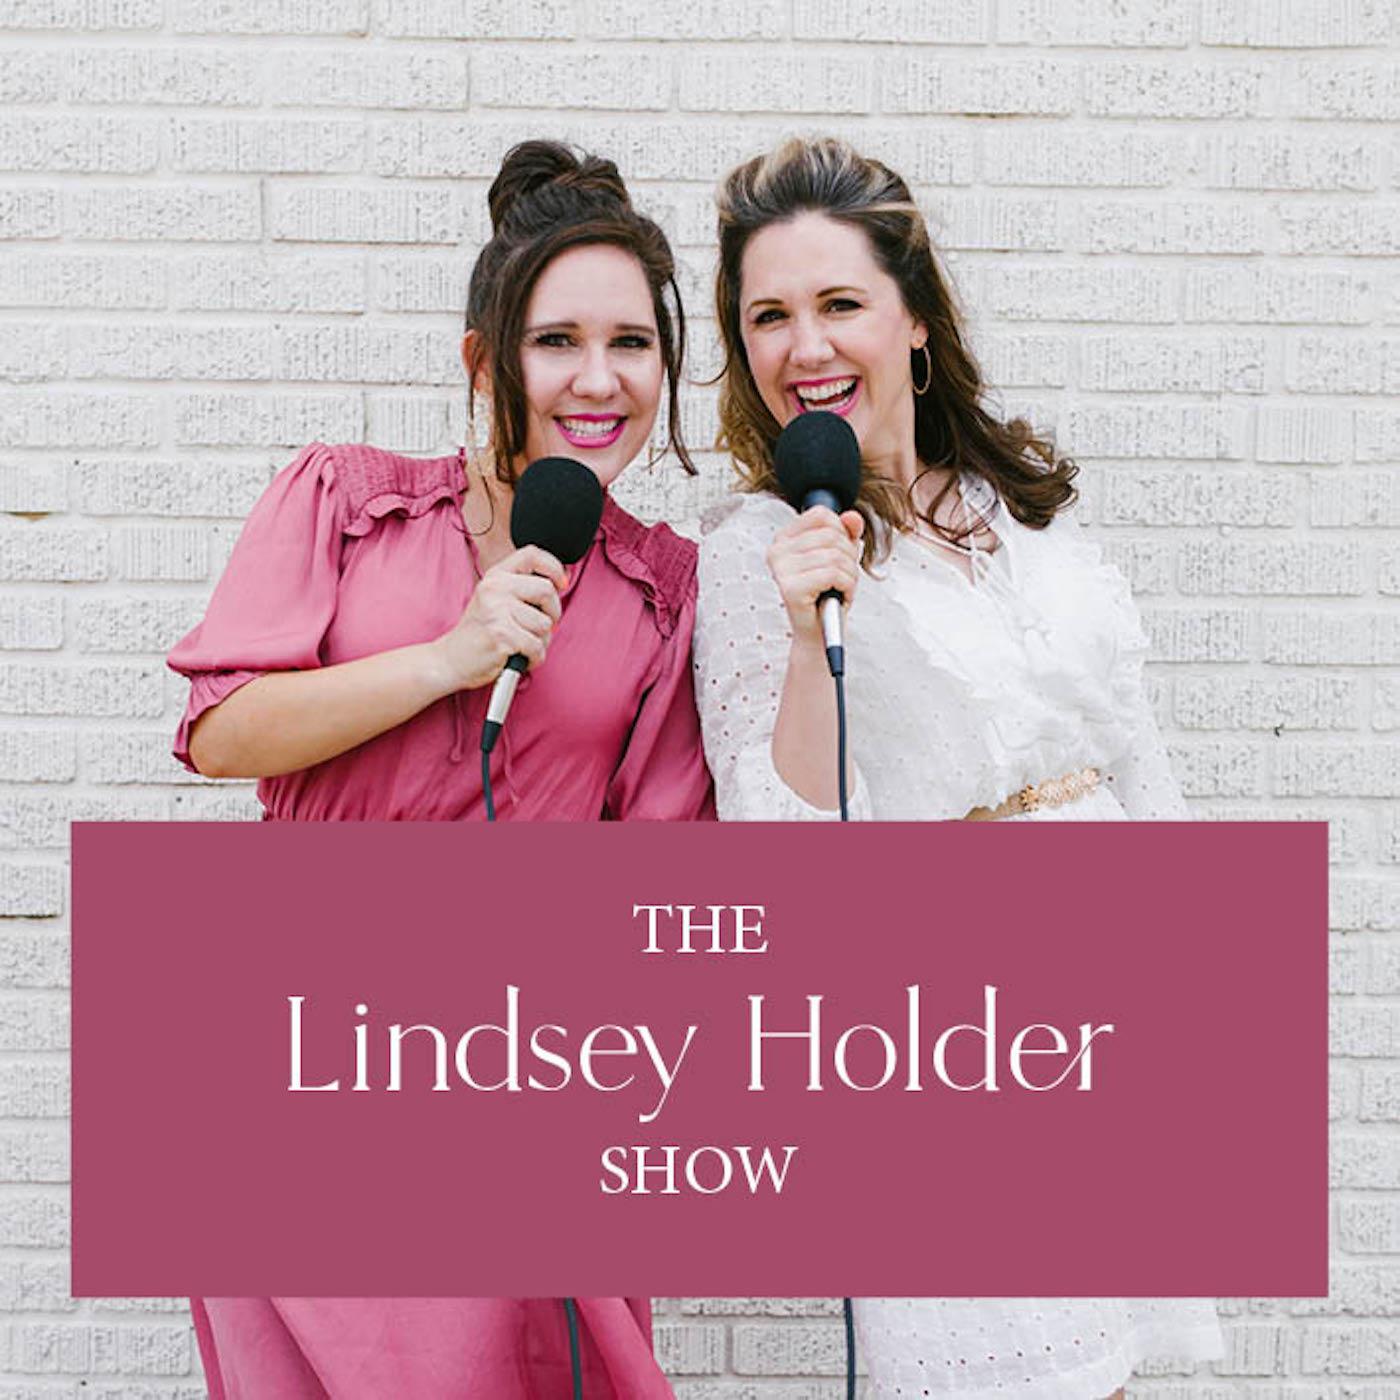 The Lindsey Holder Show show art